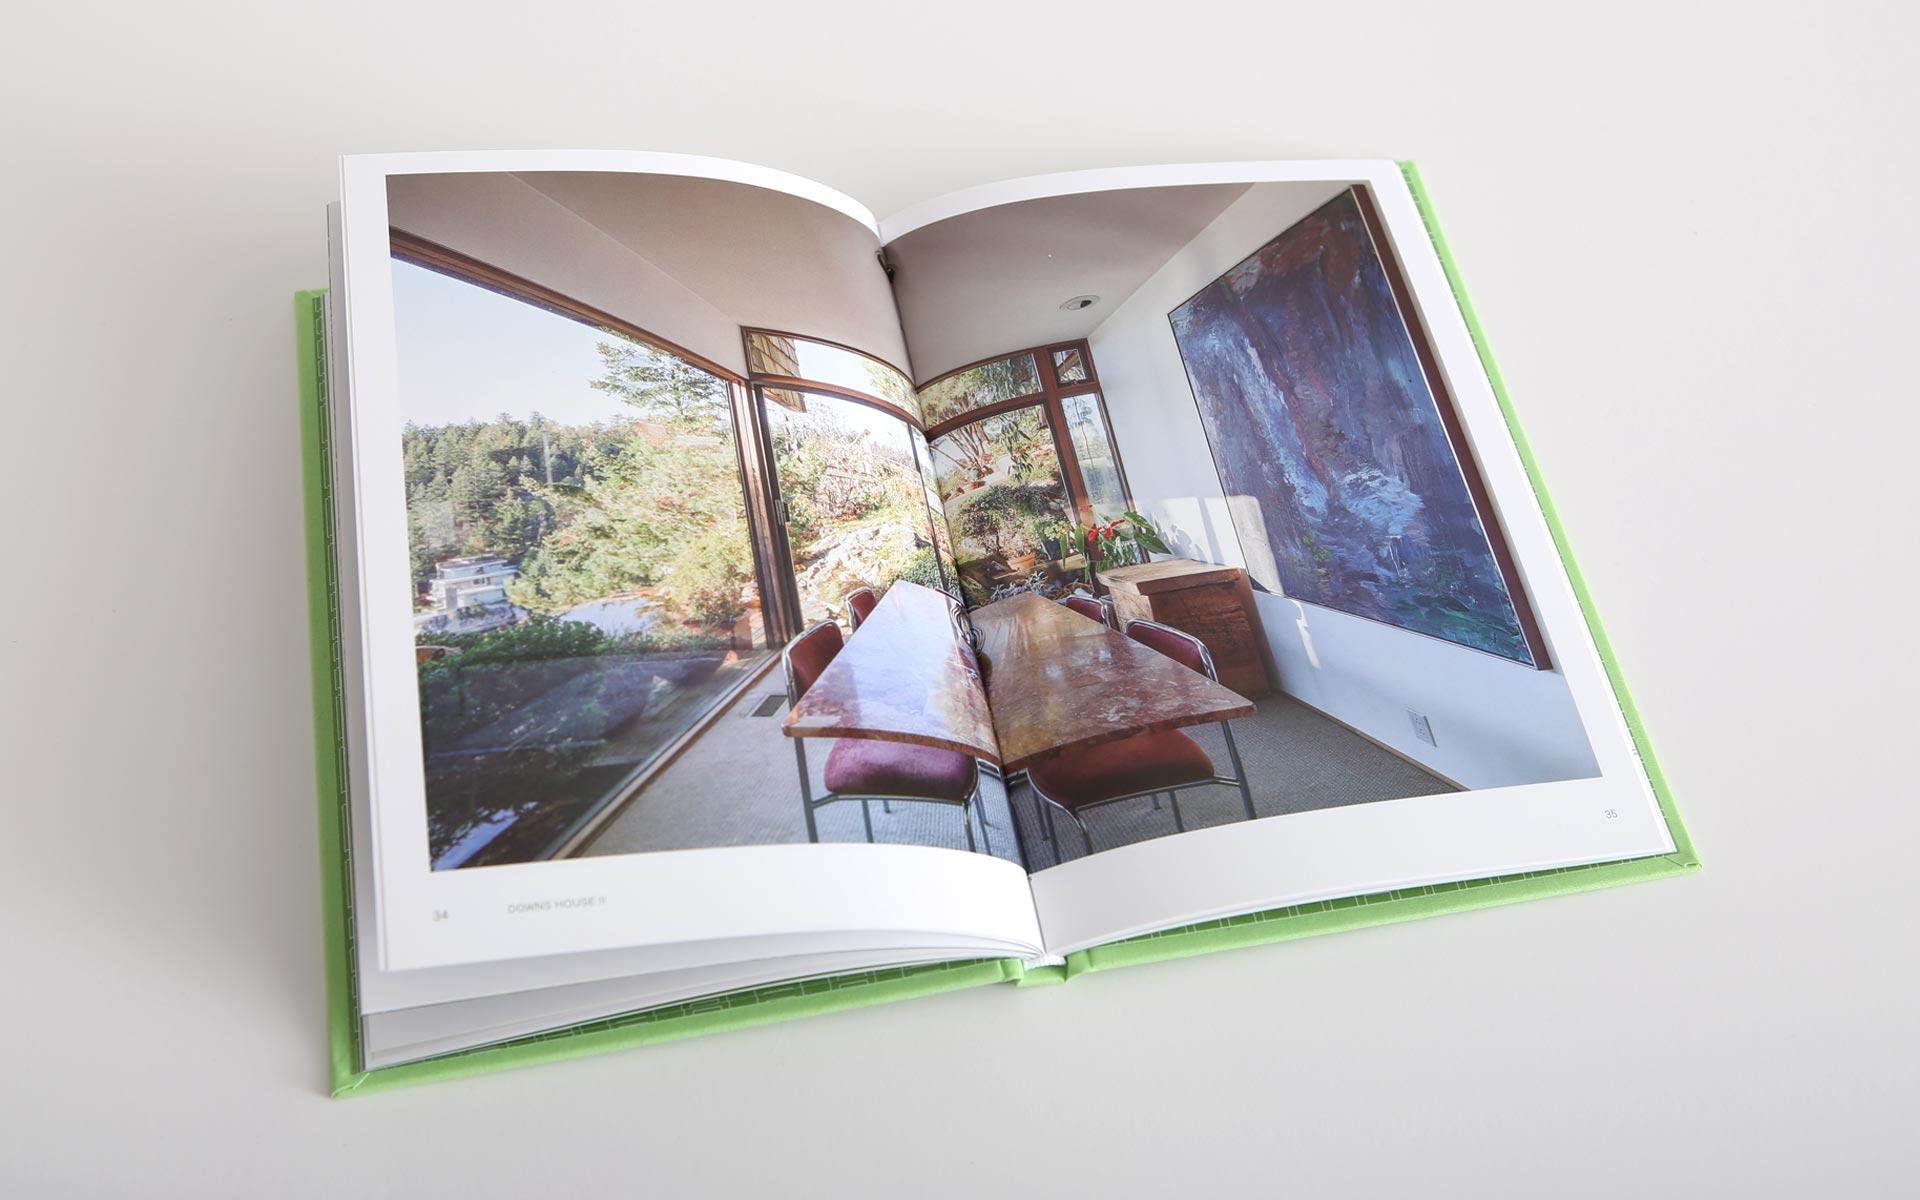 ubc-sala-book-design-6